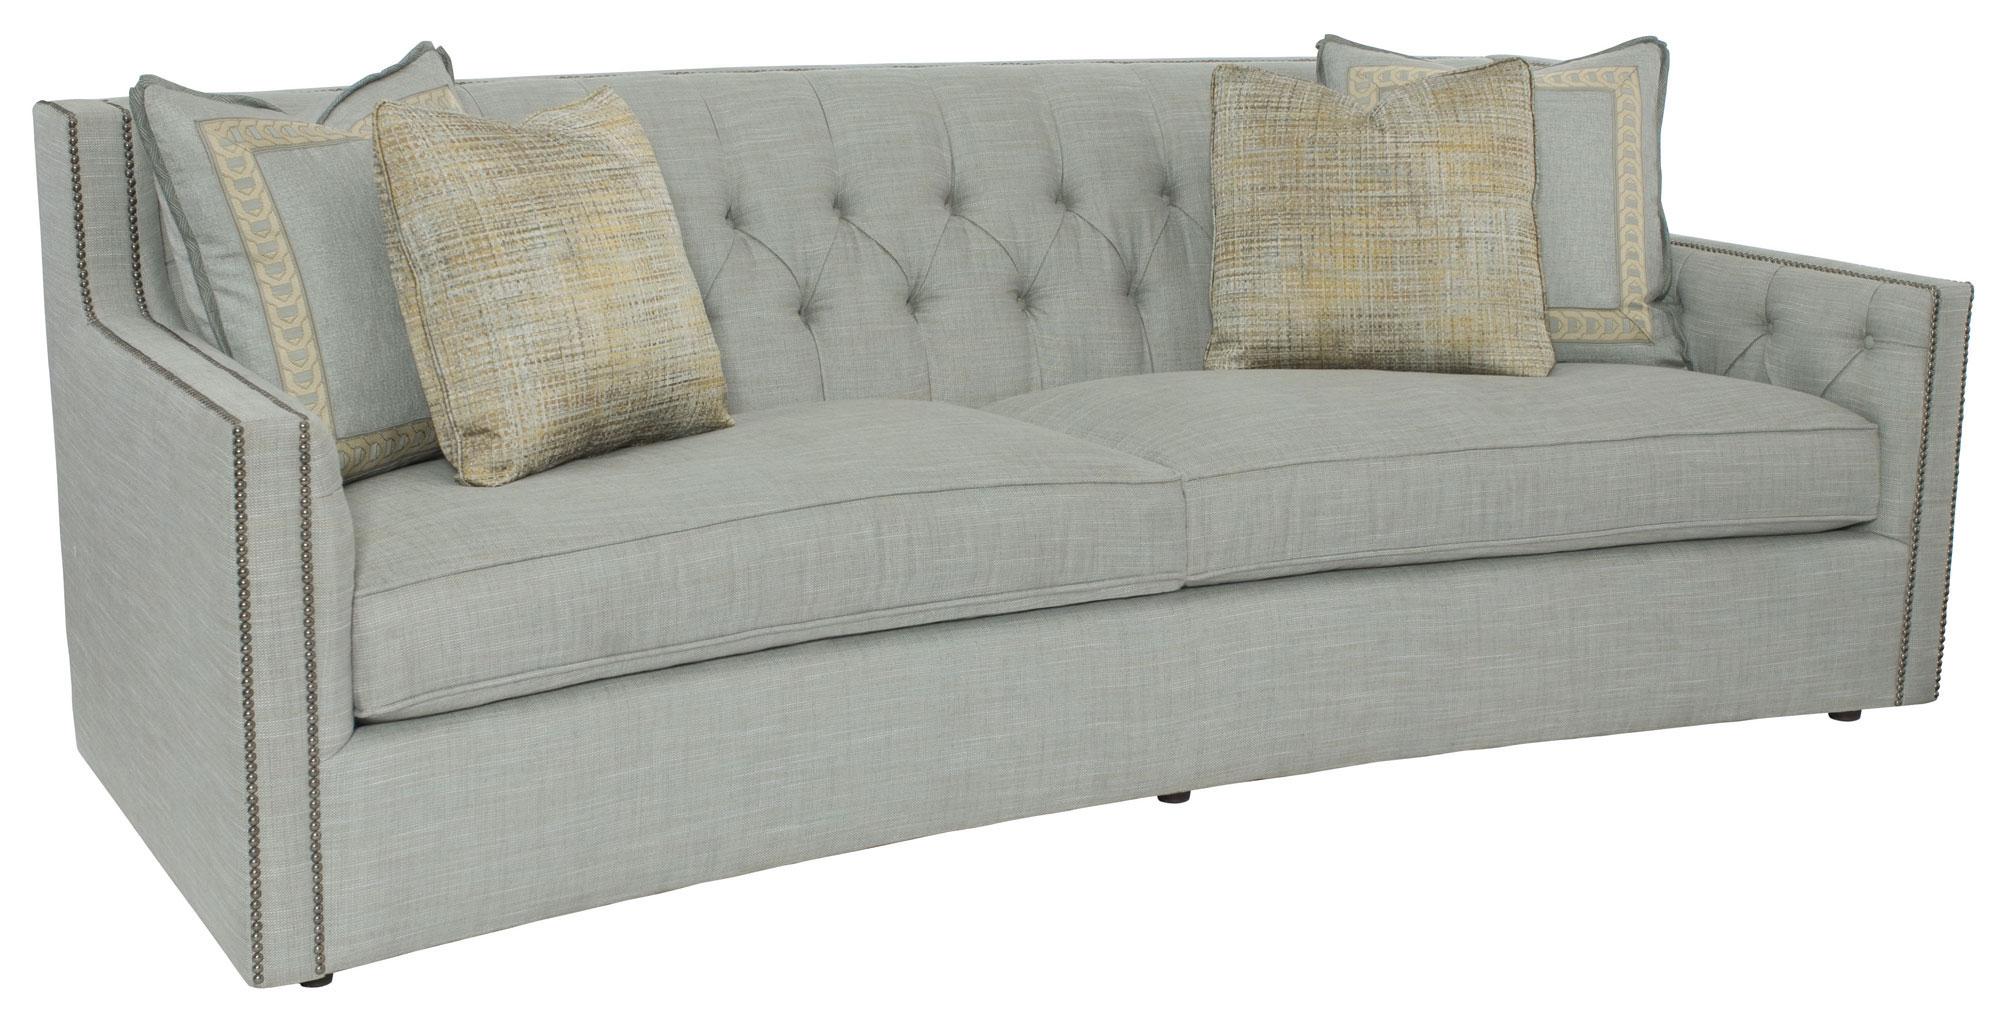 Tremendous Sofa 96 In Bernhardt Hospitality Andrewgaddart Wooden Chair Designs For Living Room Andrewgaddartcom